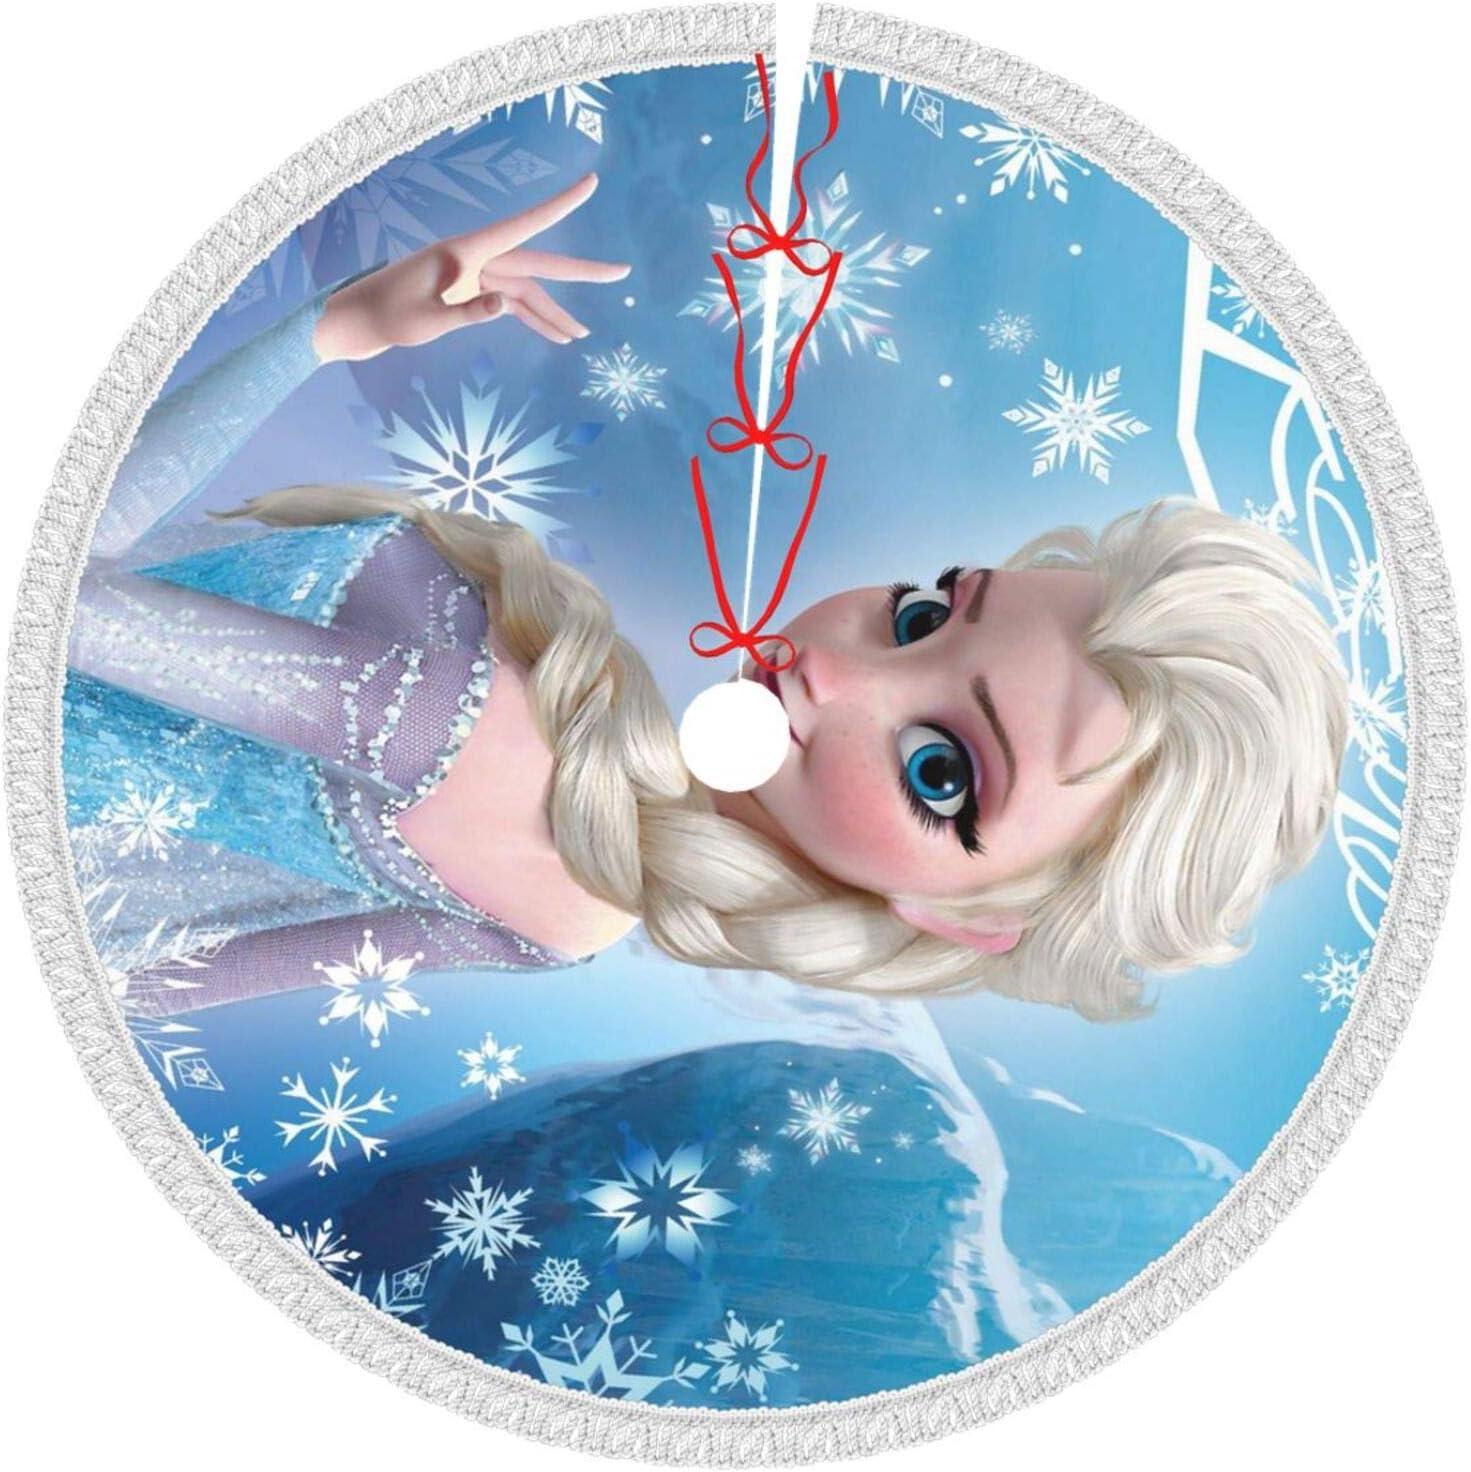 Nicjoy Christmas Tree マーケット お歳暮 Skirt Decorations Ye New Outdoor